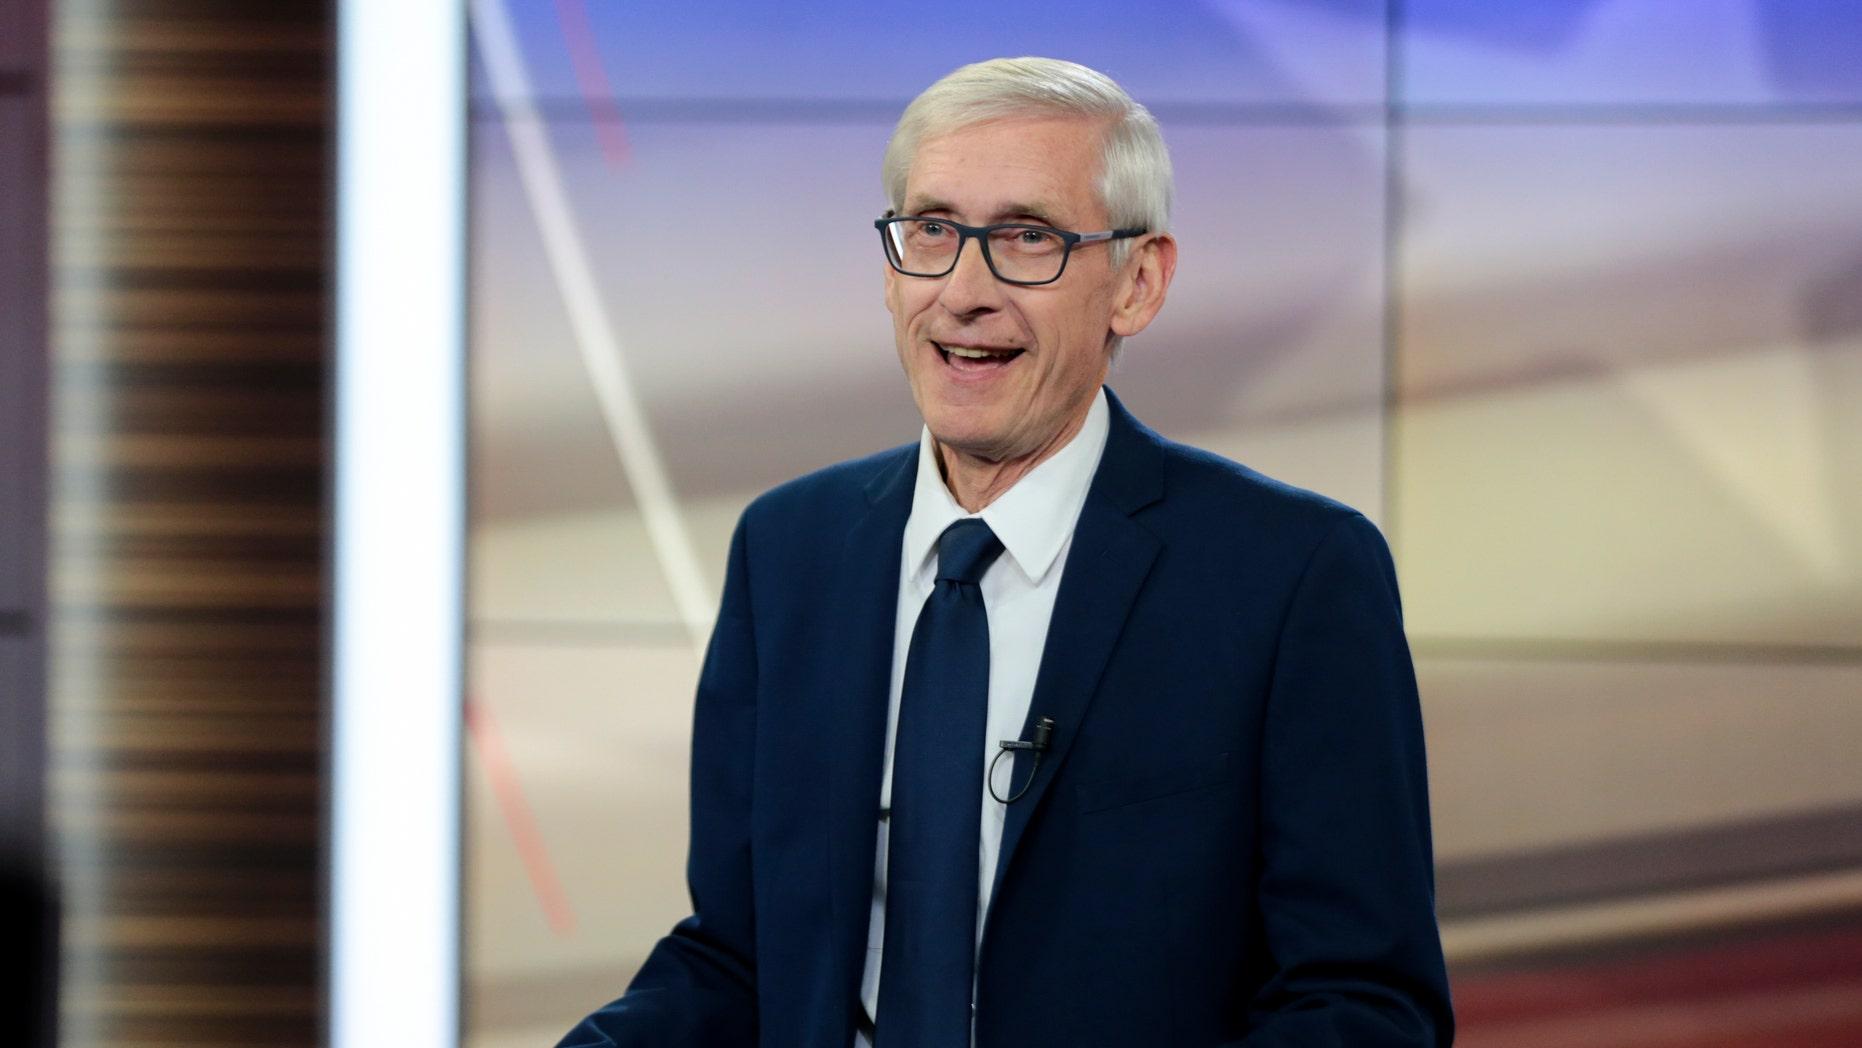 Wisconsin gubernatorial Democratic nominee Tony Evers has been accused of plagiarizing multiple budget proposals.